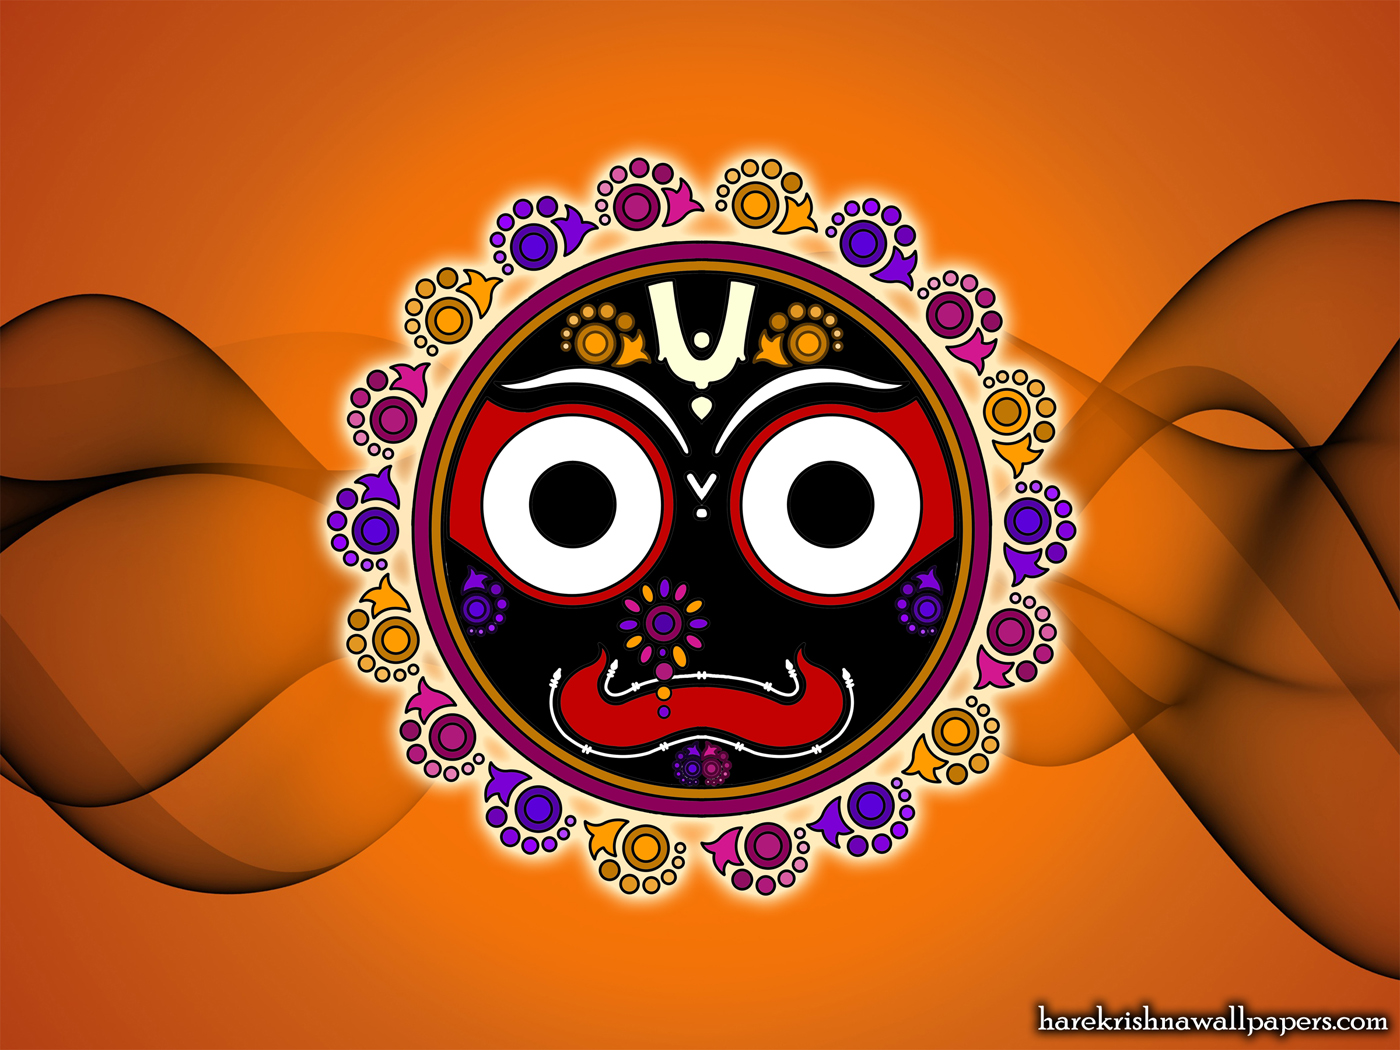 Jai Jagannath Wallpaper (043) Size 1400x1050 Download